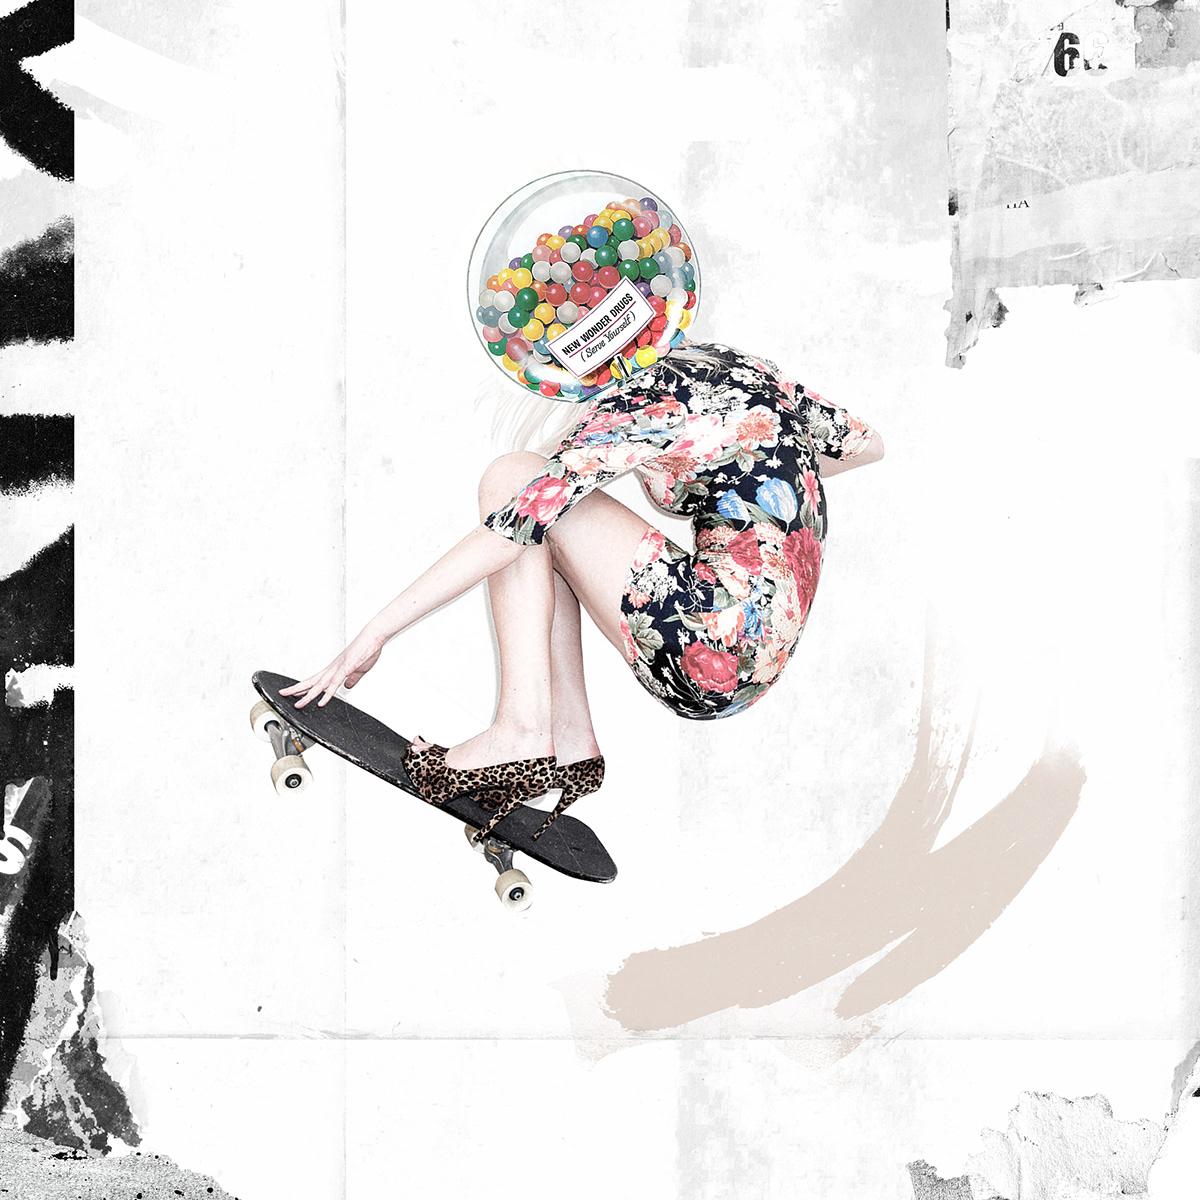 artwork collage cut and paste digital graphic ILLUSTRATION